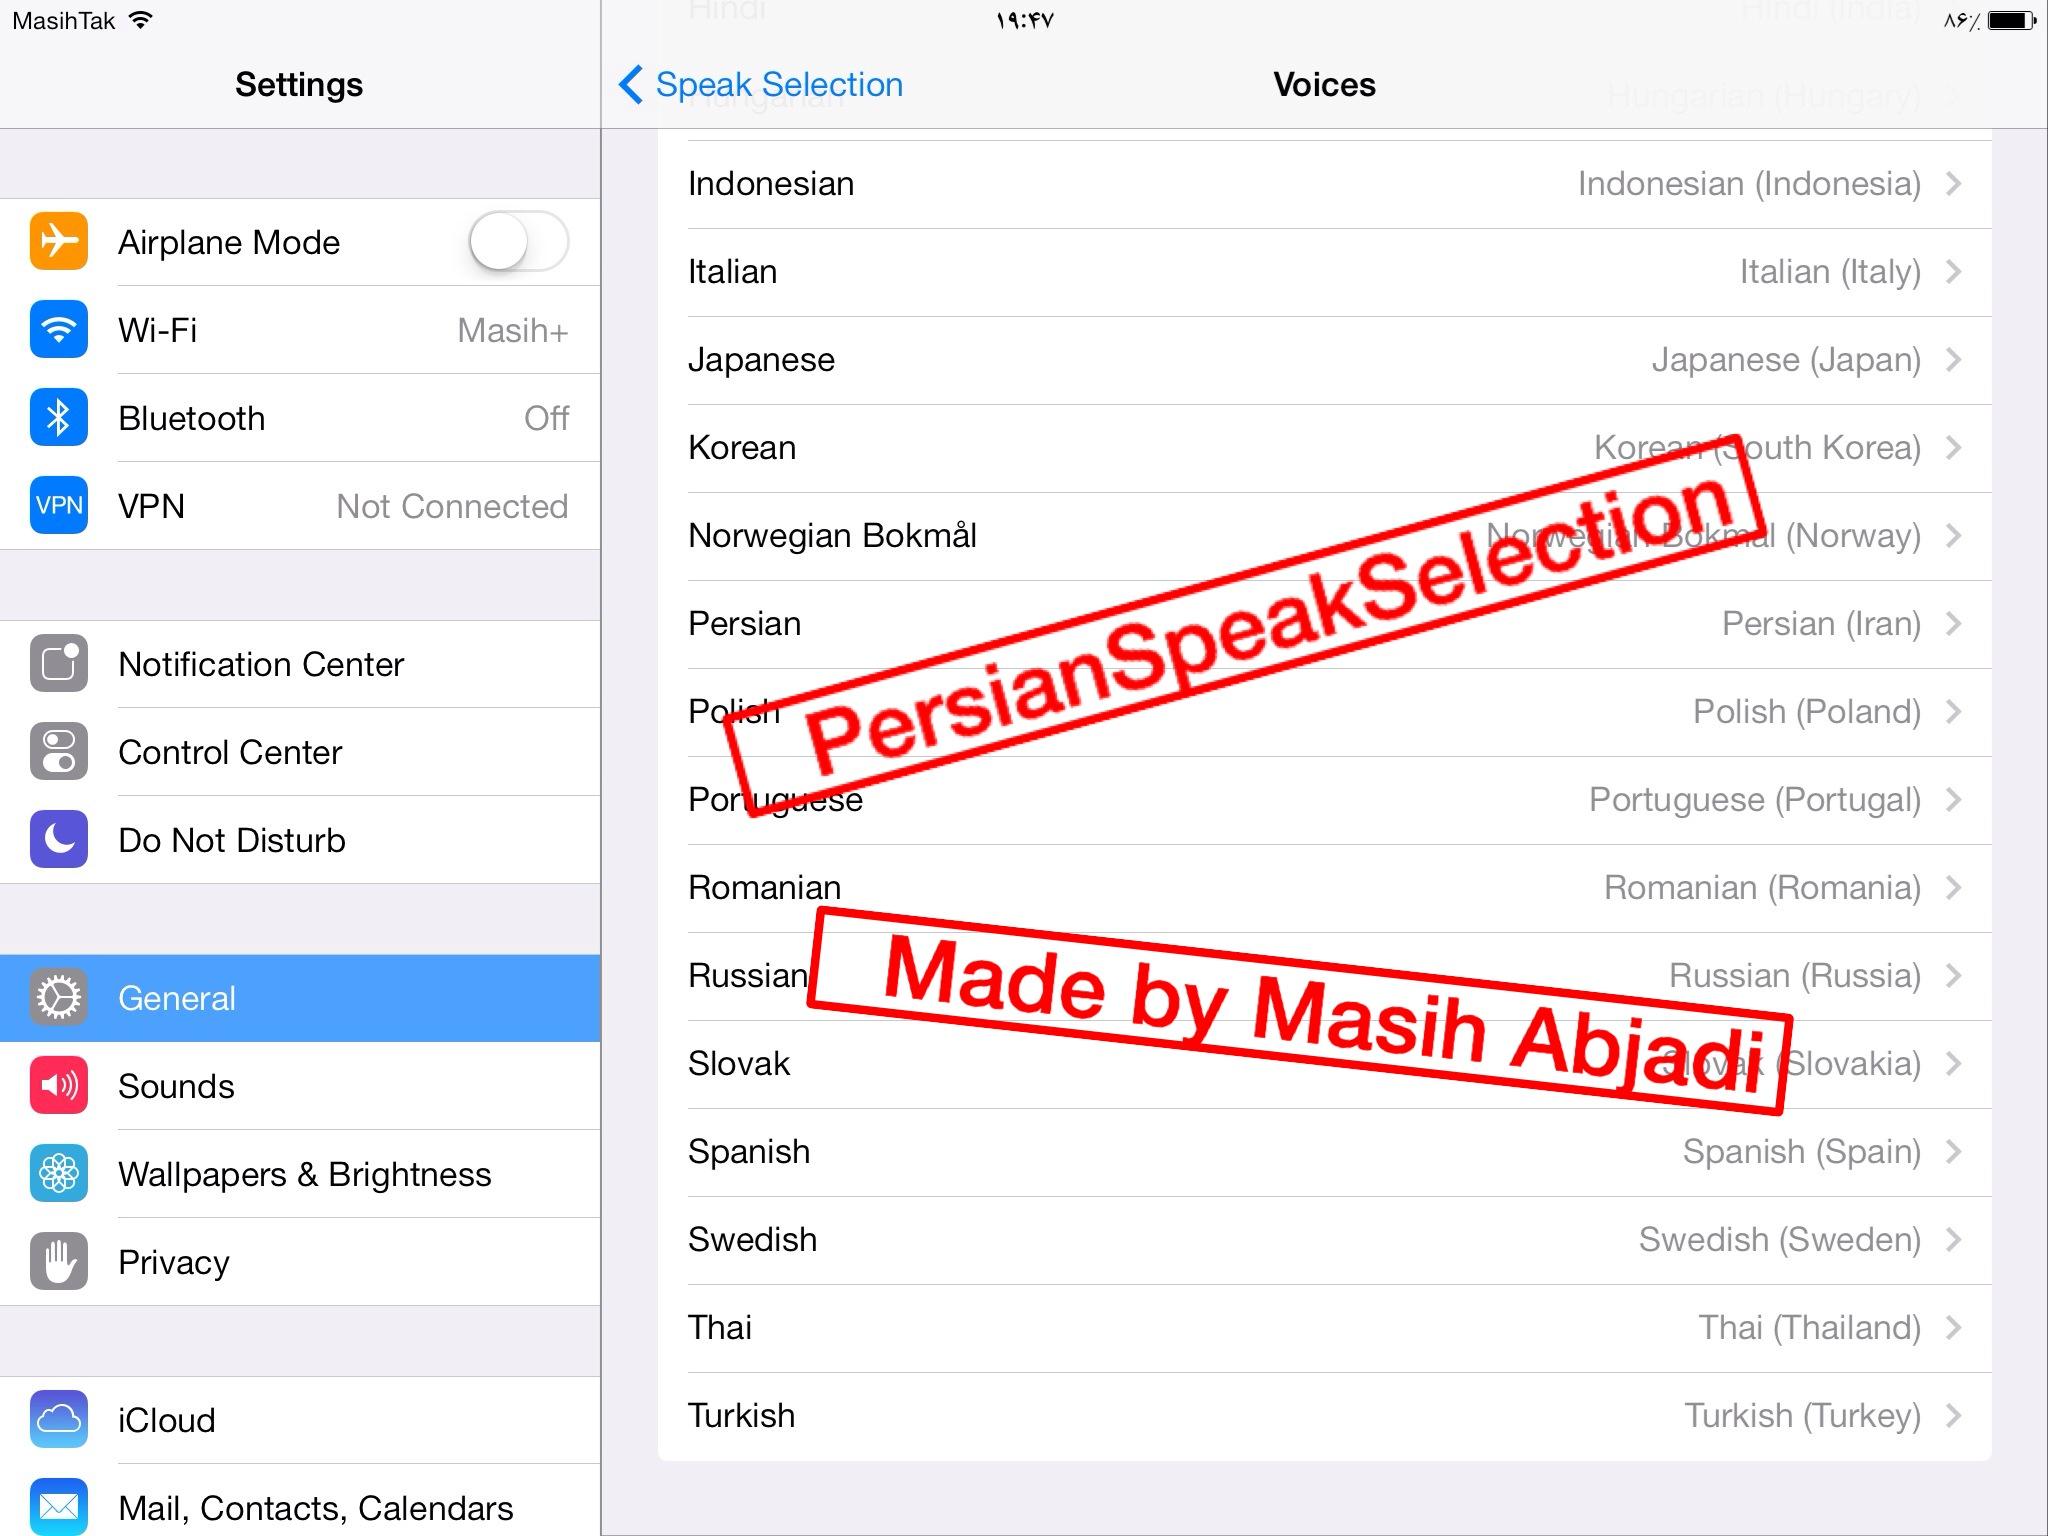 Persian Speak Selection by MasihTak